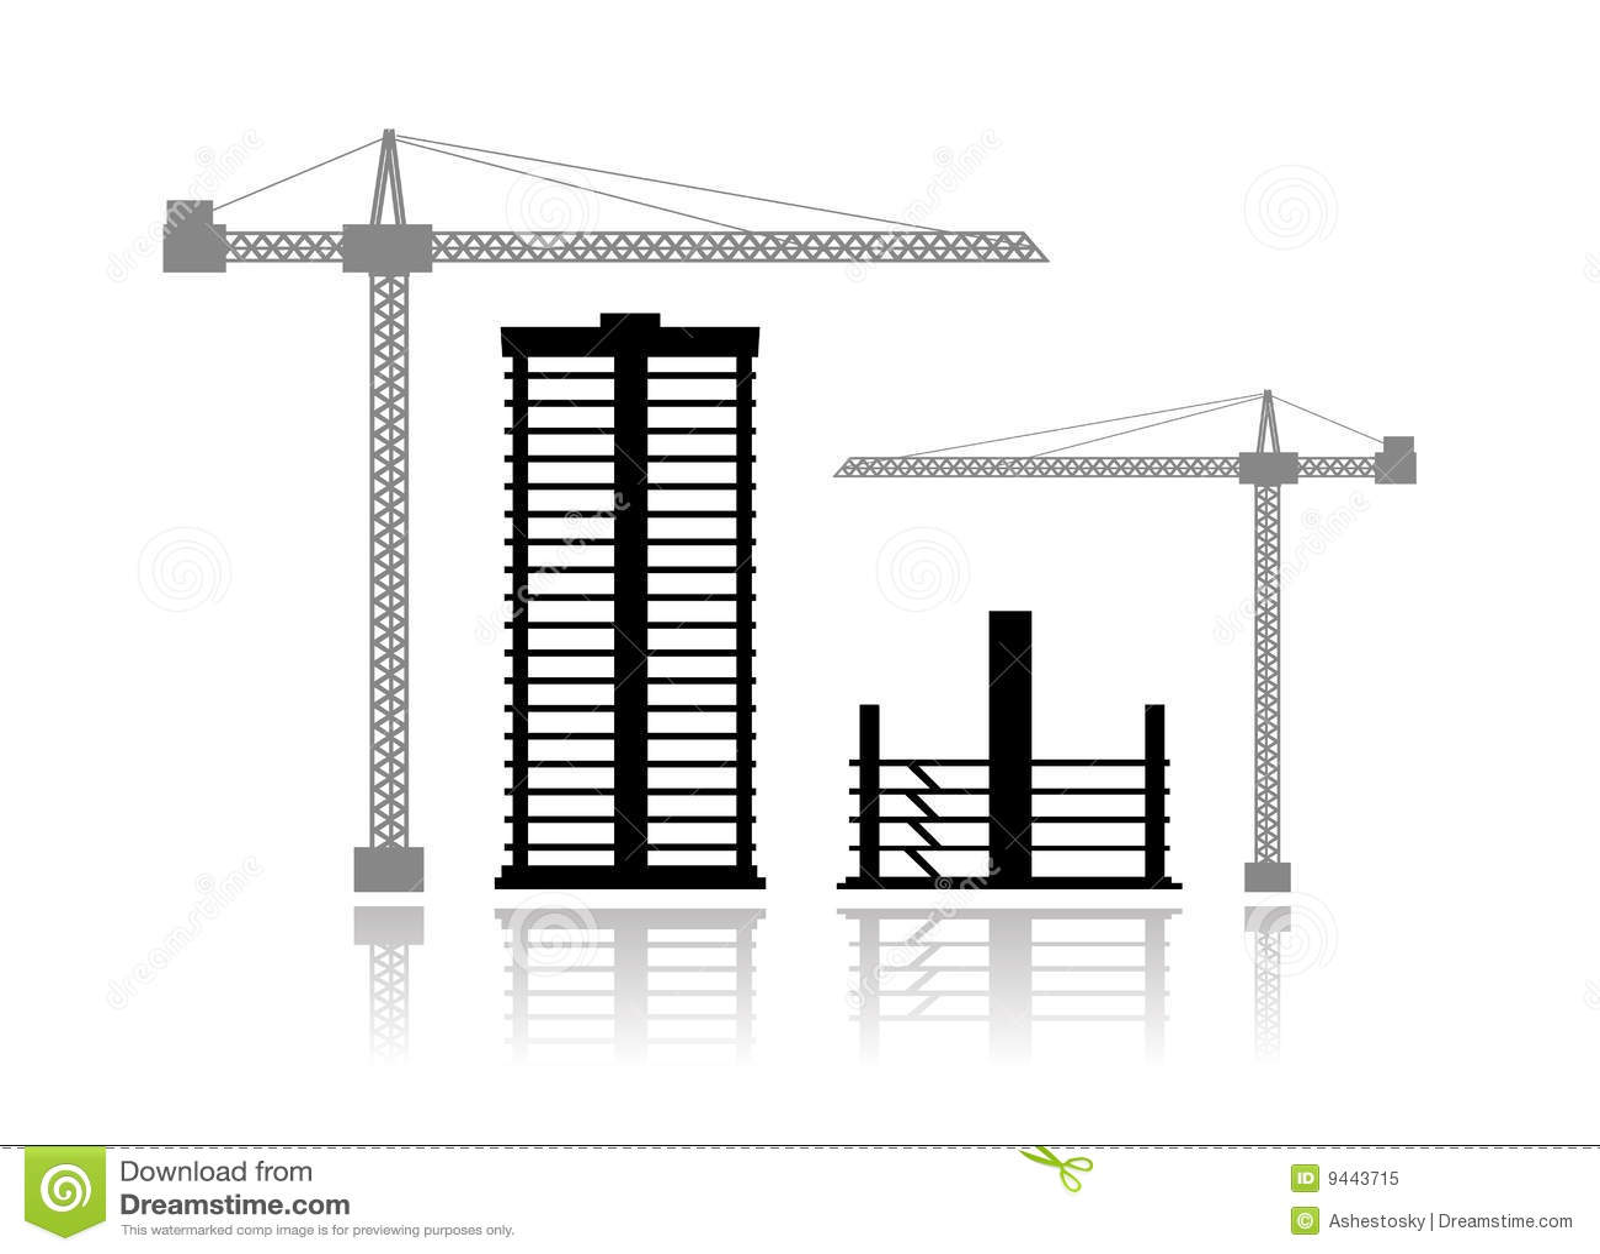 Buildings Under Construction Stock Vector